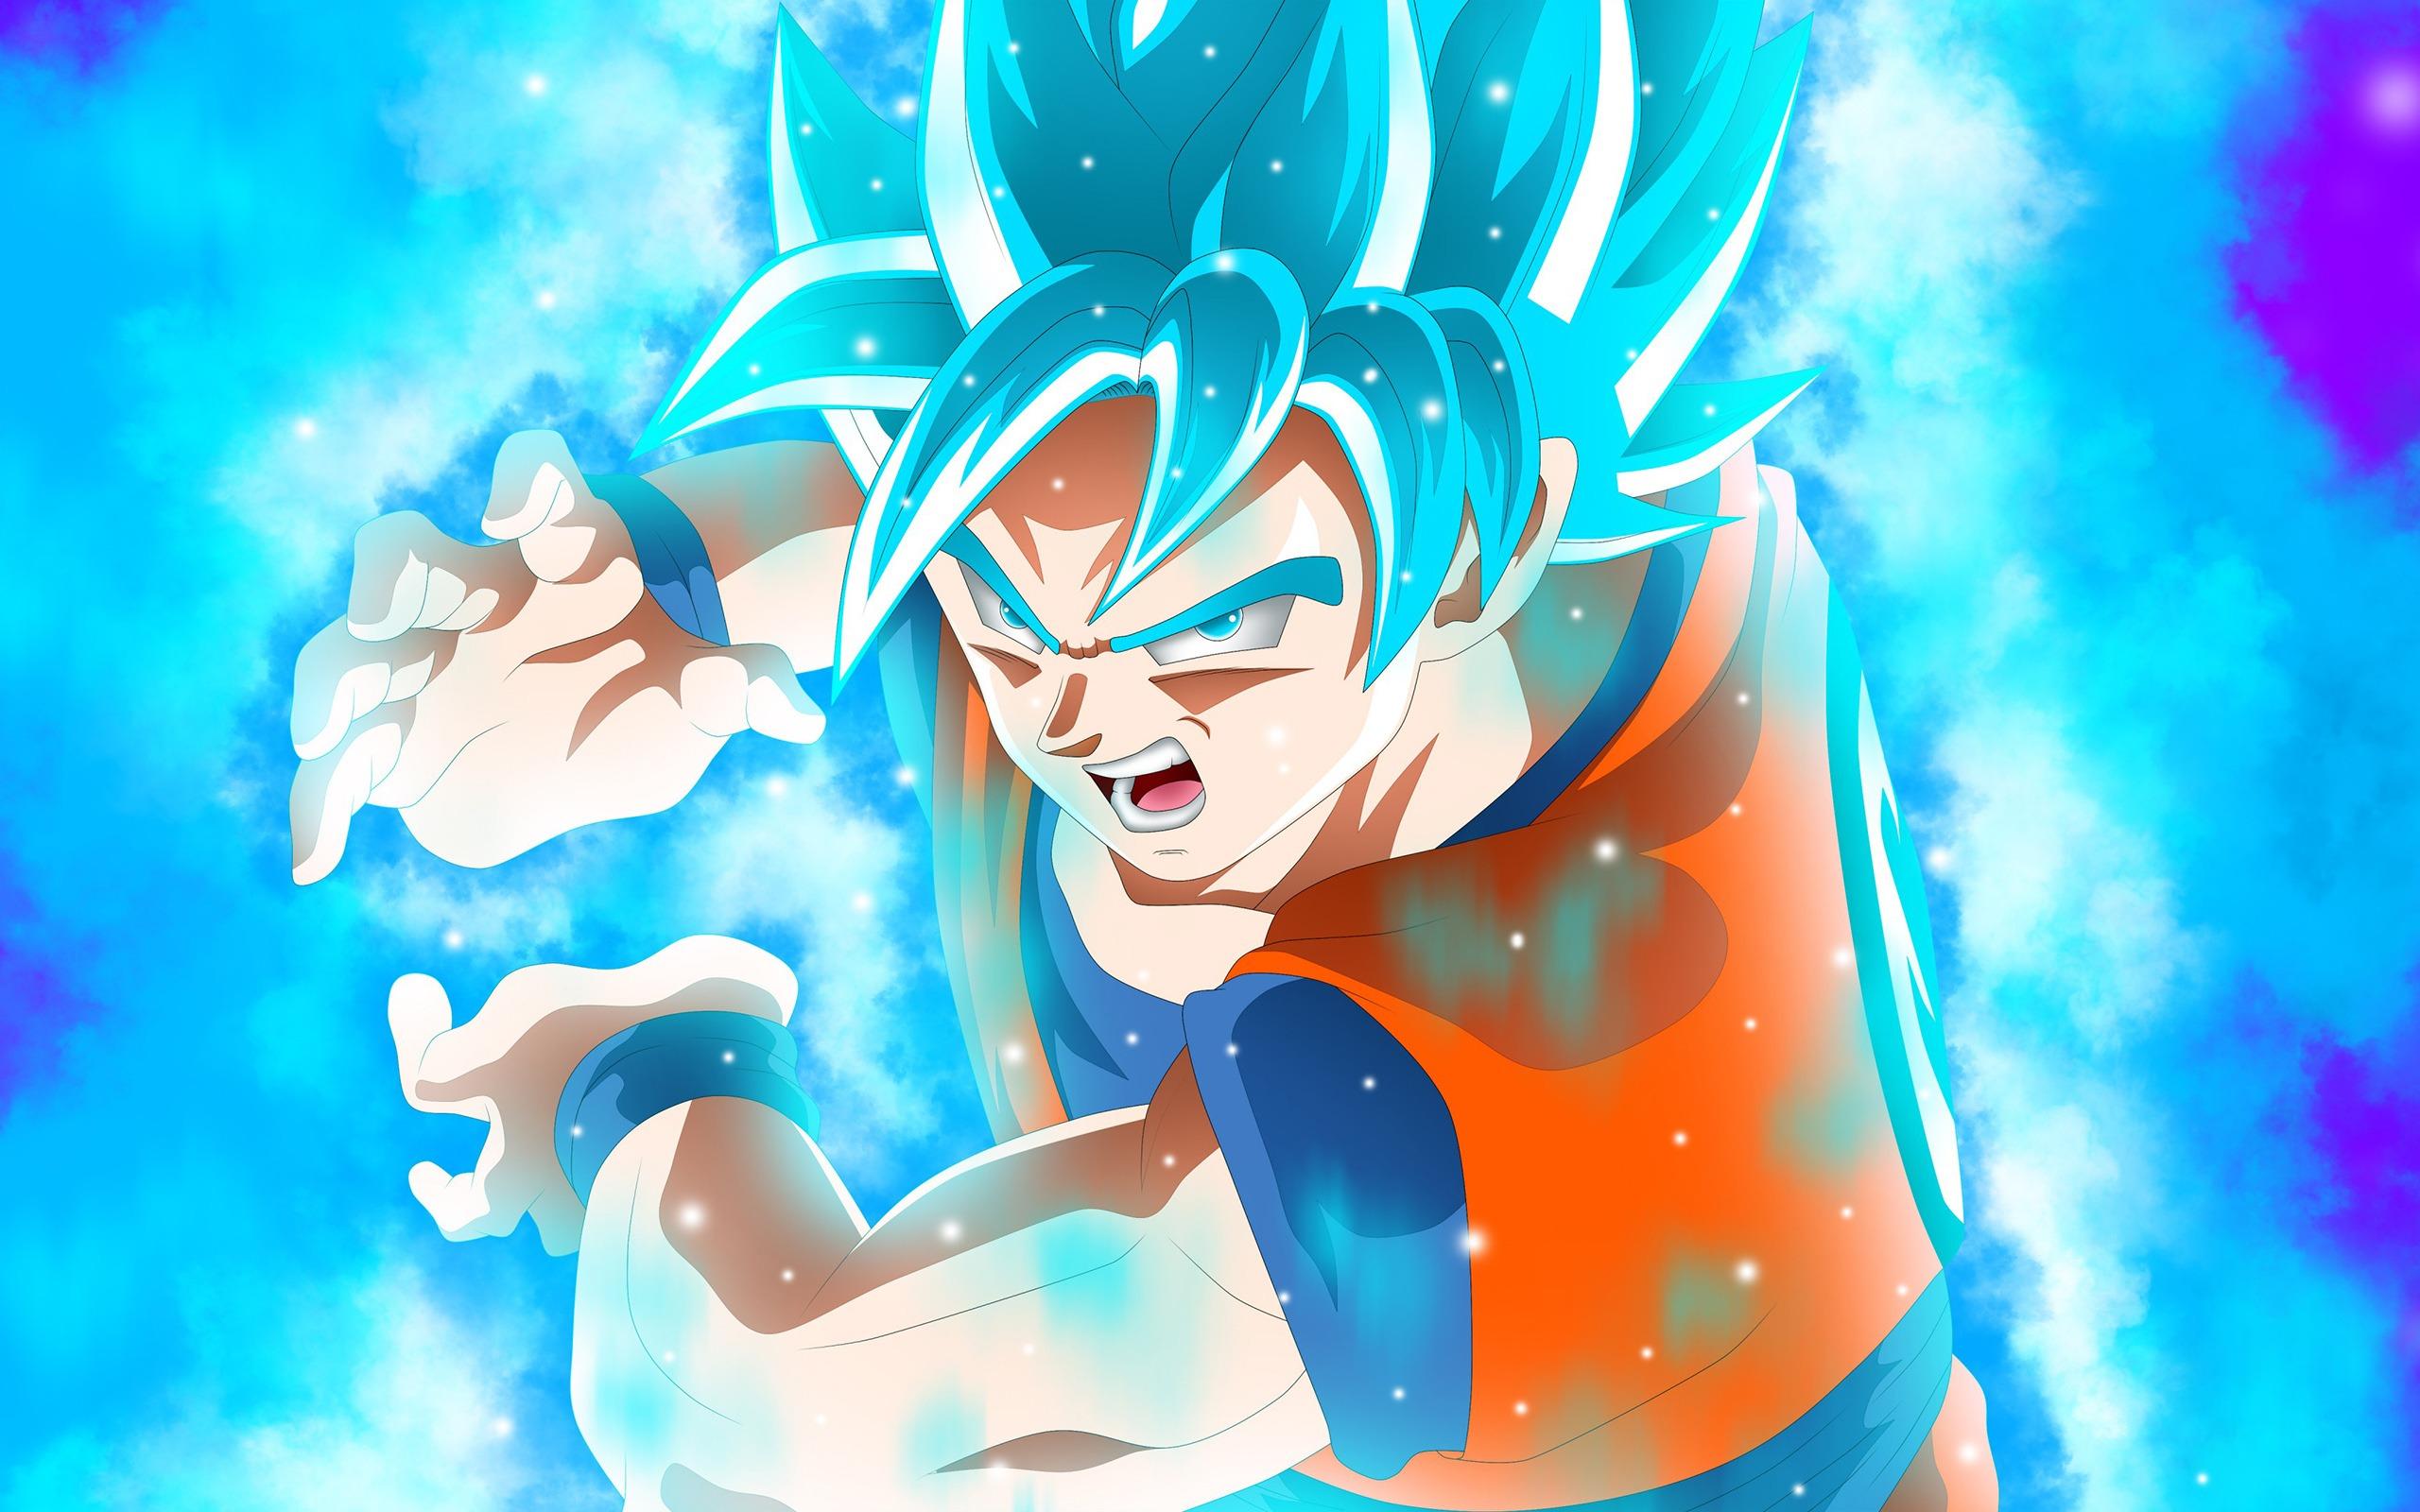 Dragon Ball Super Anime Design Hd Wallpaper 15 Avance